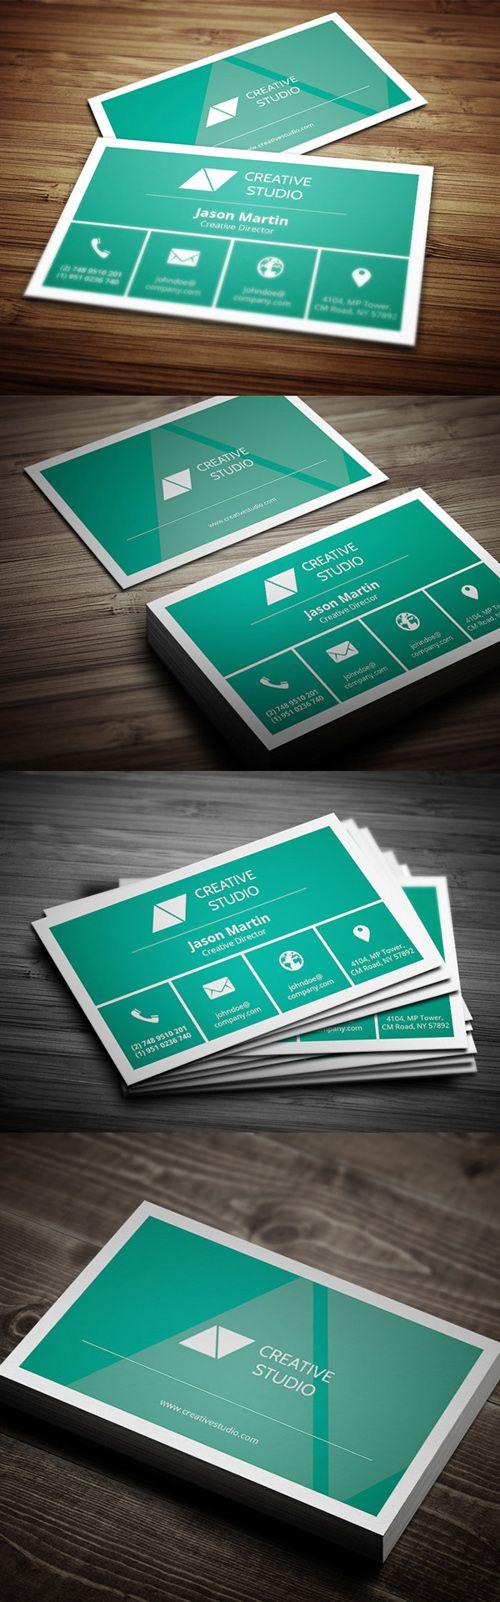 Metro business card design business card carto de visitas designs of print ready business cards design reheart Choice Image